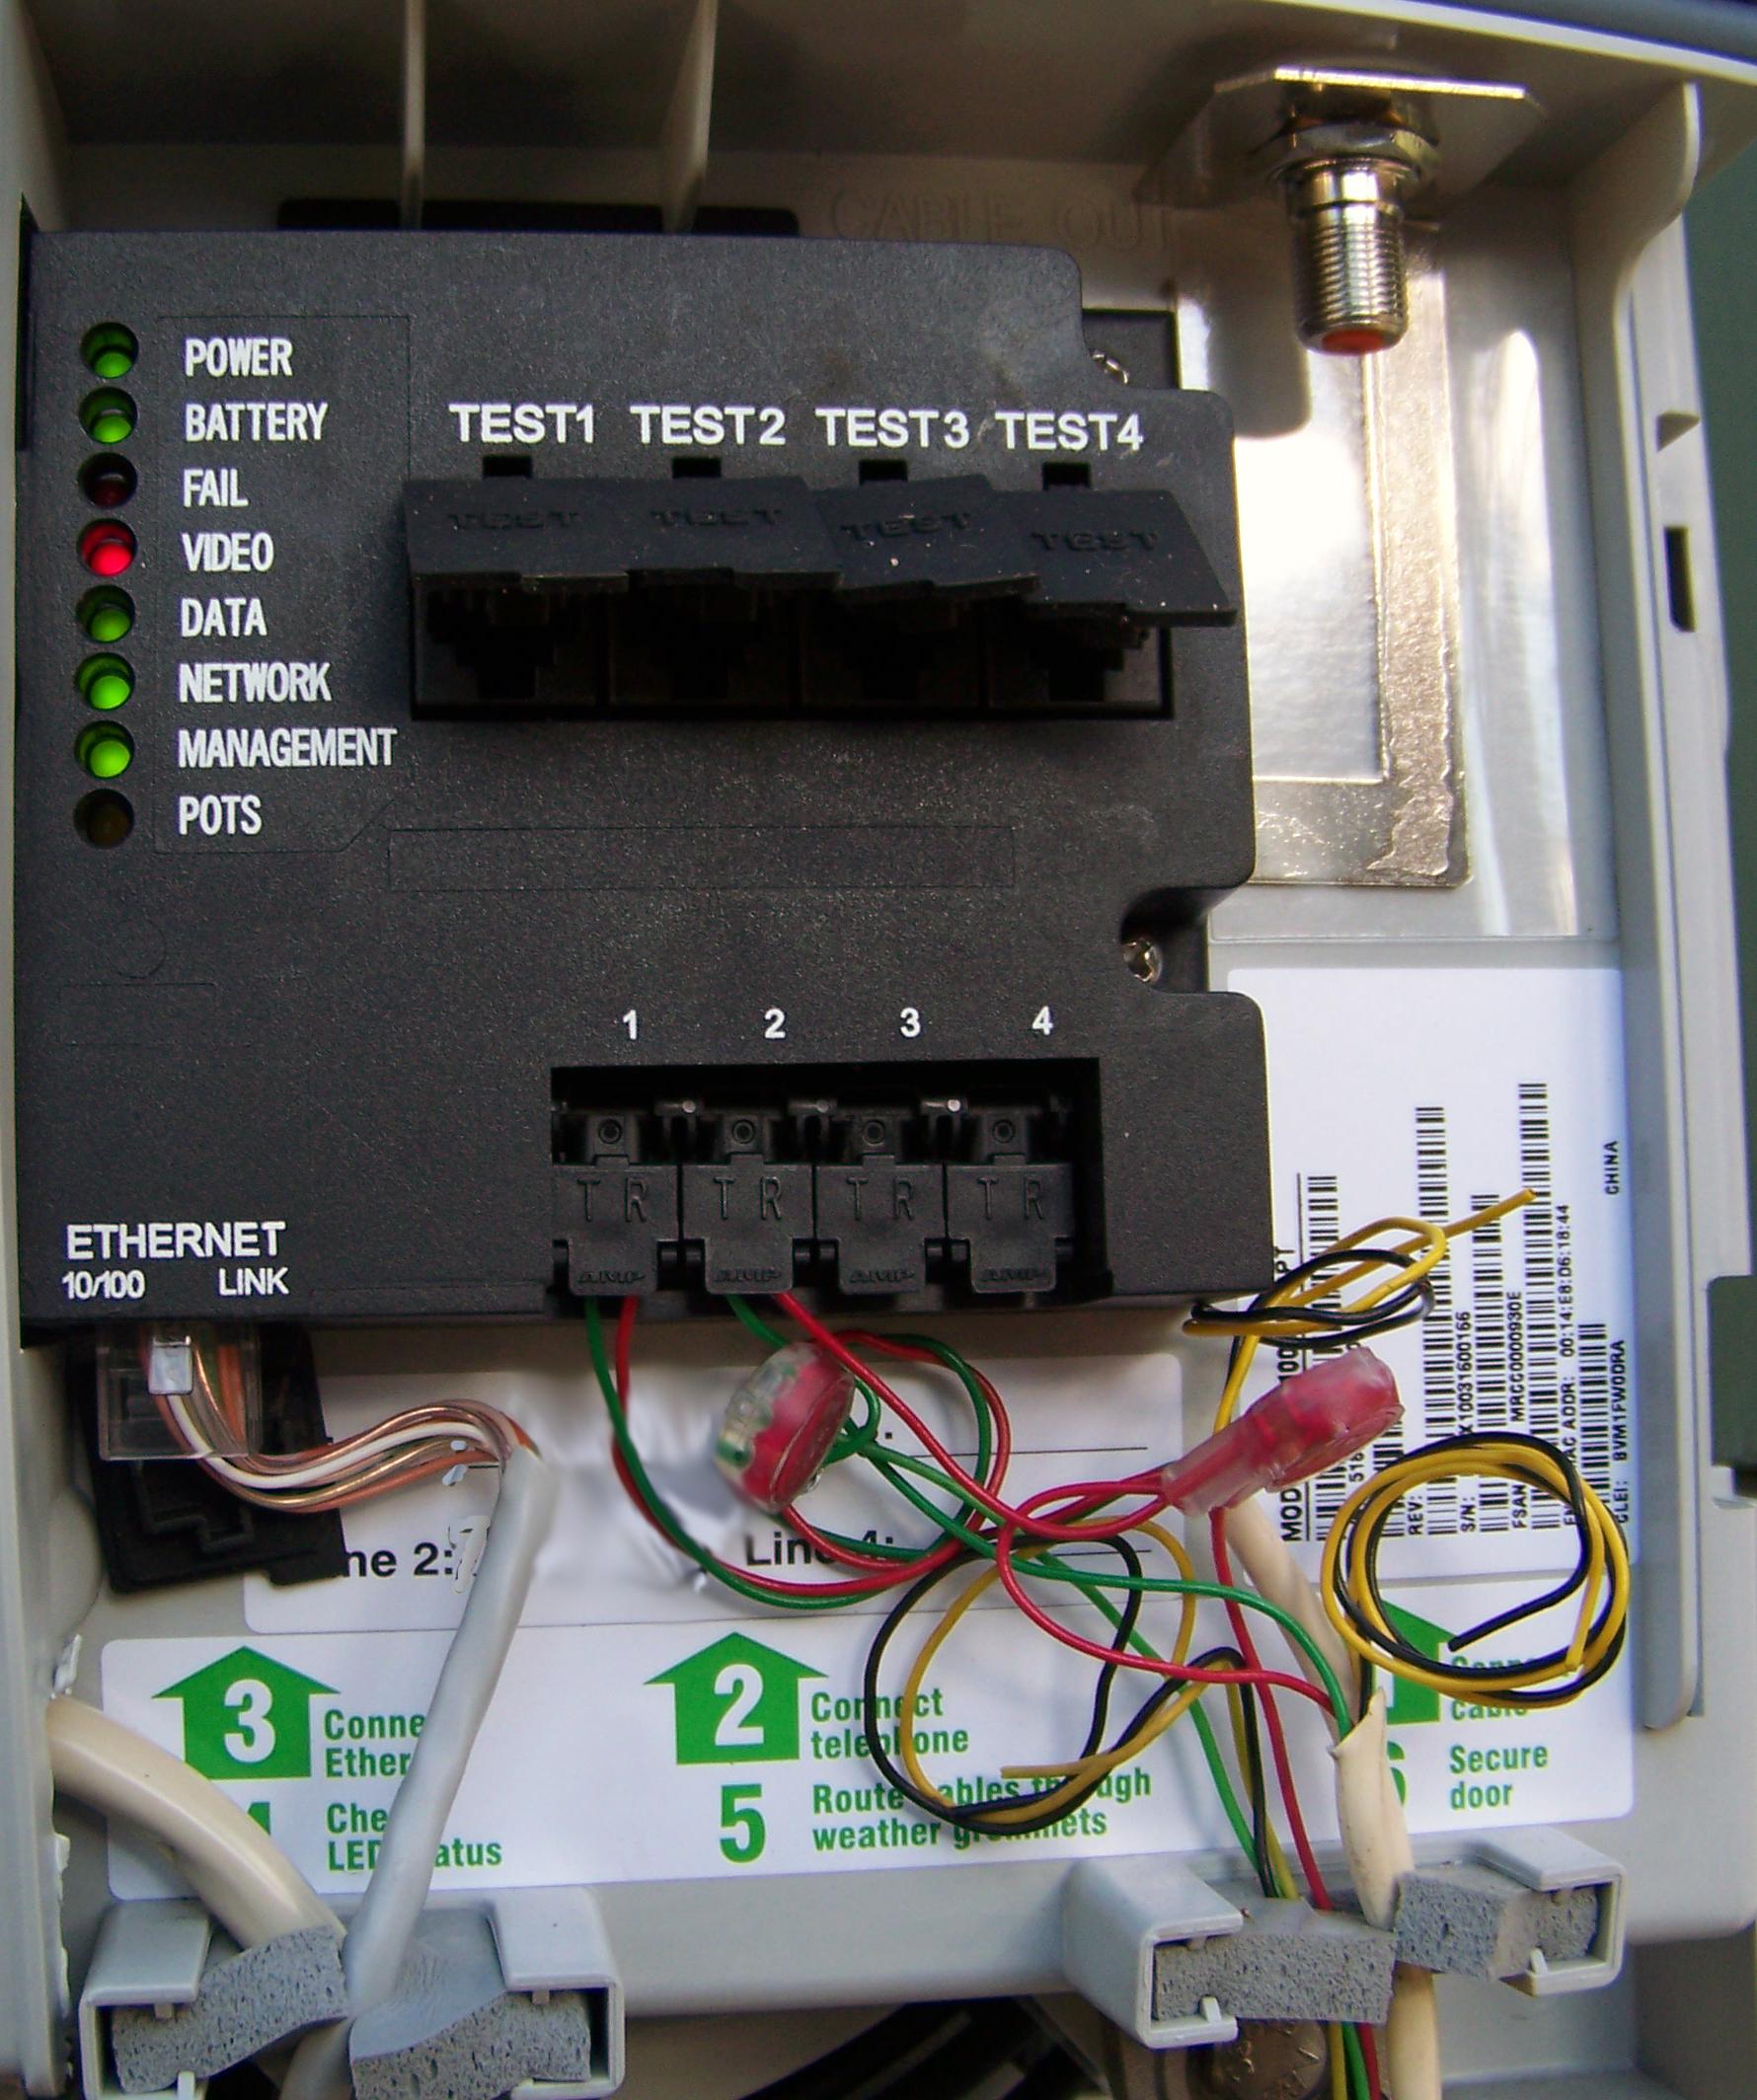 Verizon Fios Ont Question Electrical Diy Chatroom Home Improvement